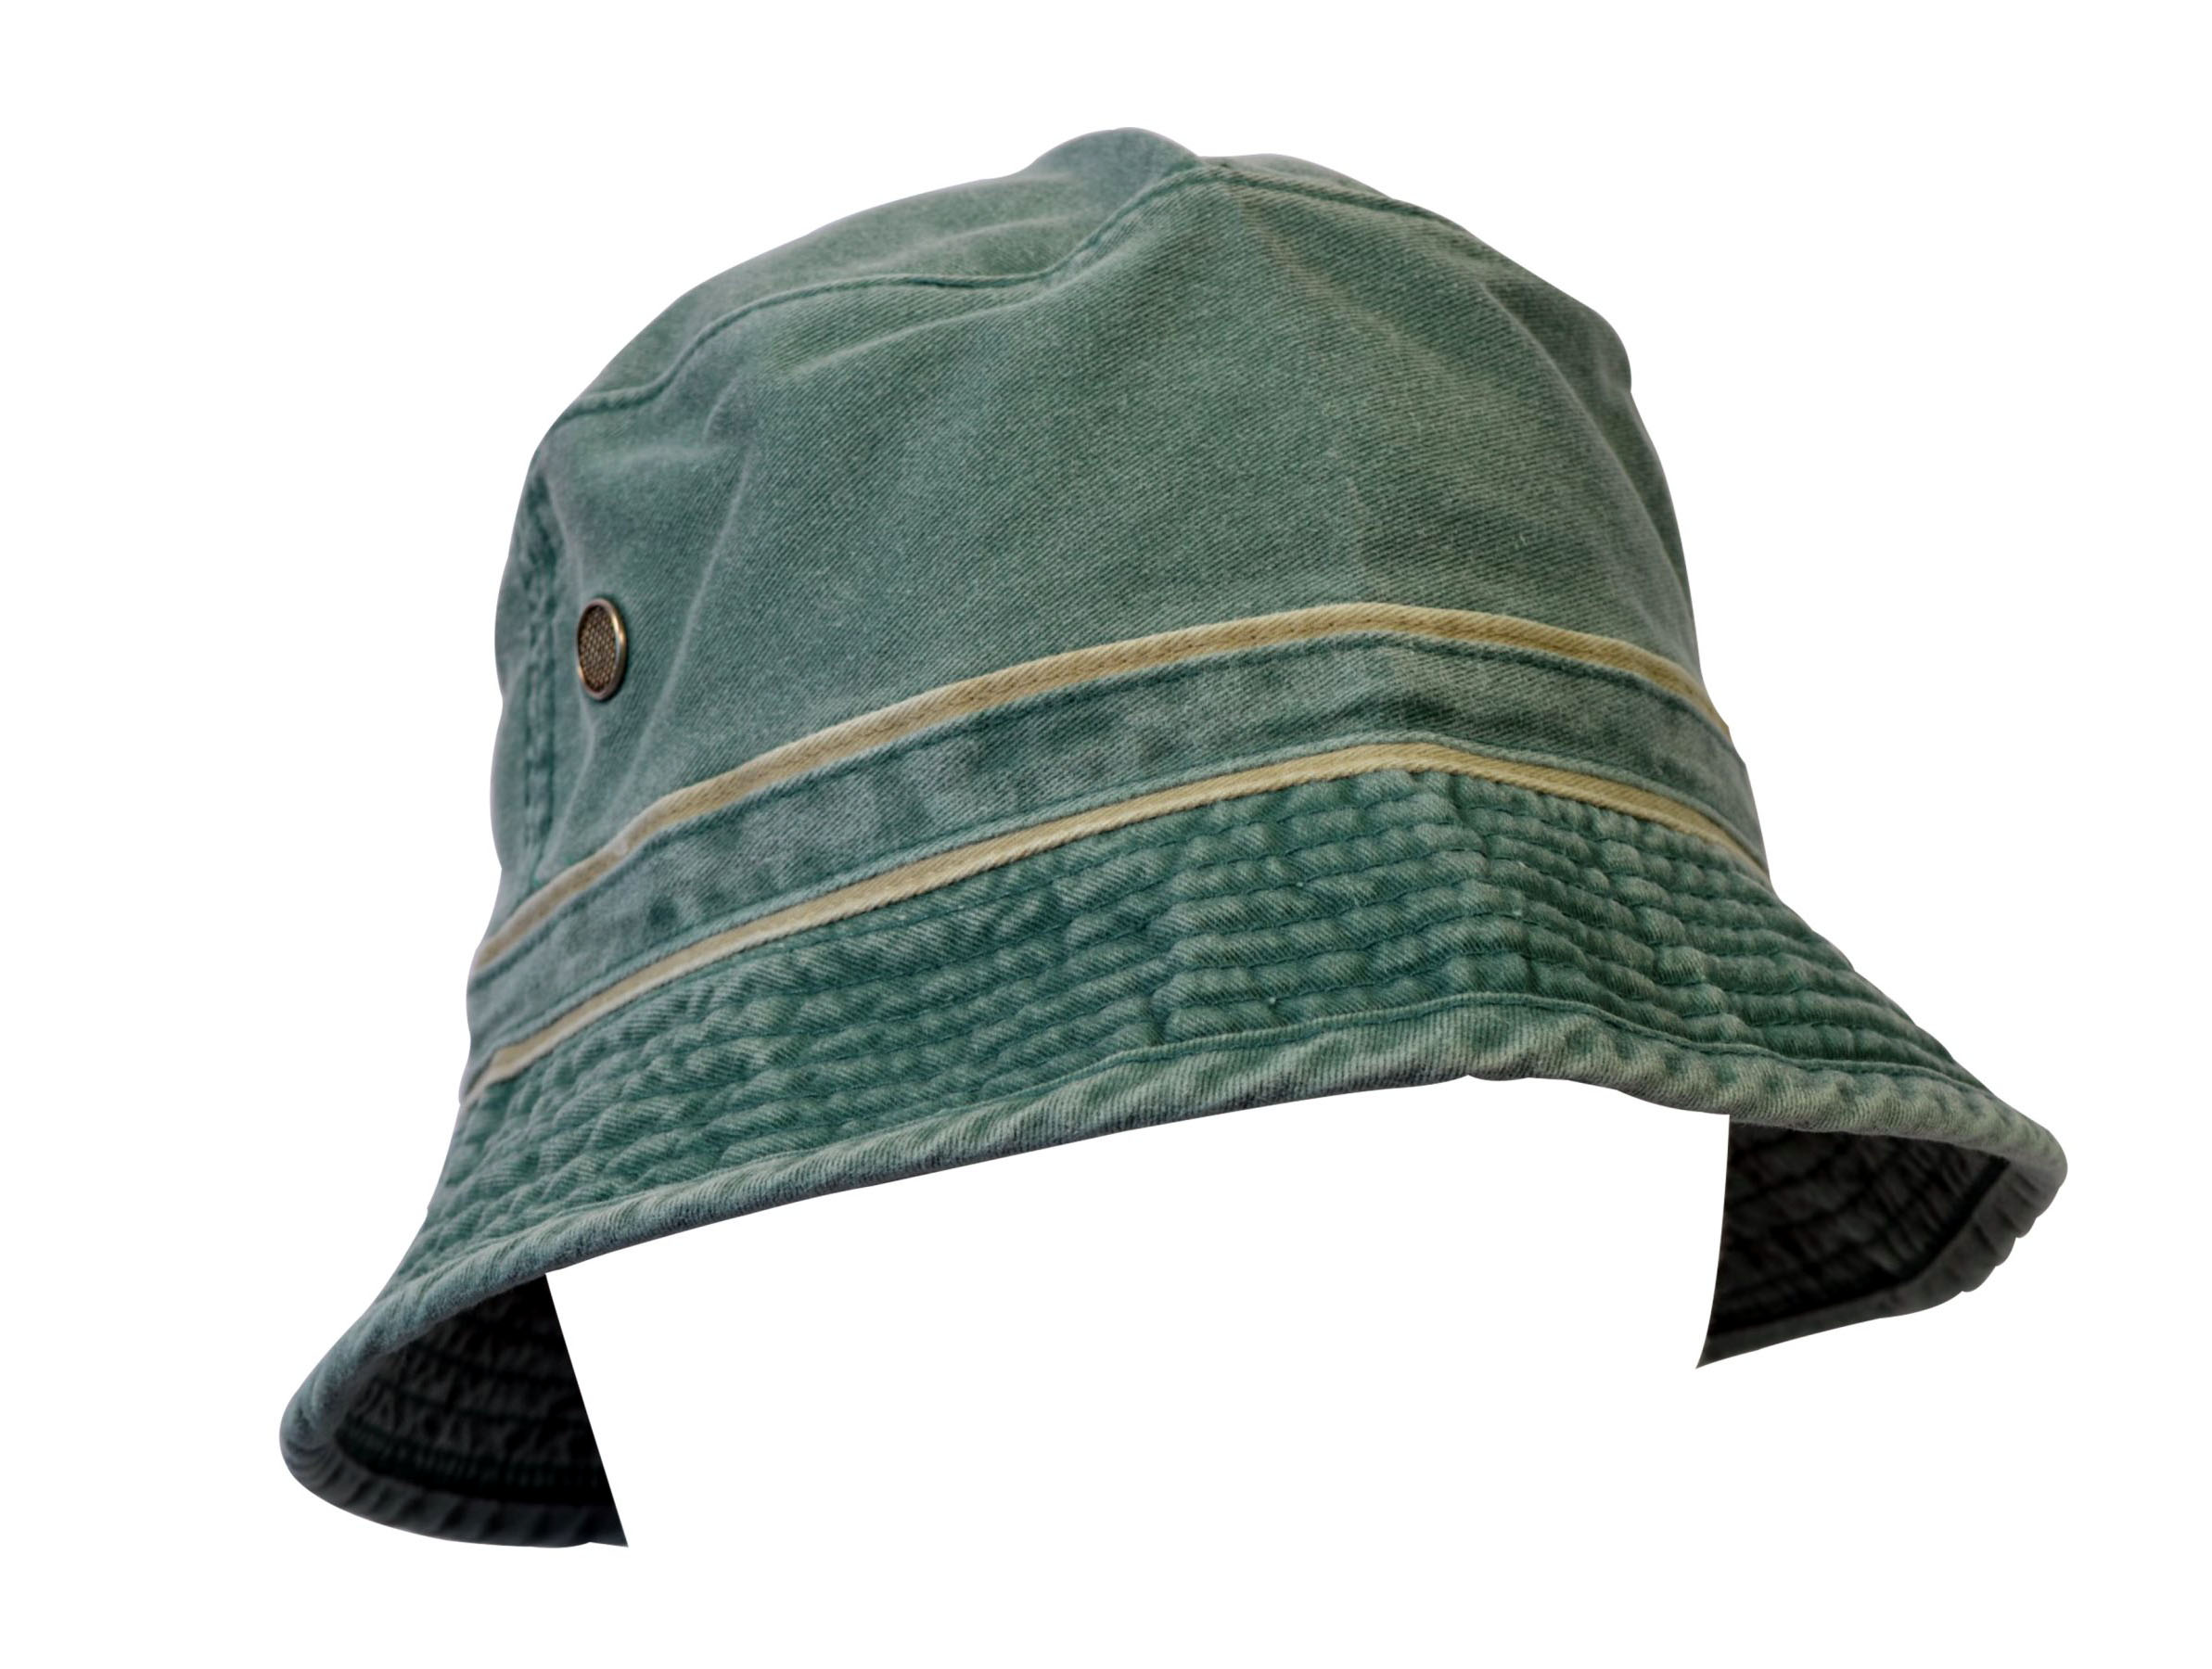 Kc caps bucket hat boonie hunting fishing outdoor men cap for Fishing boonie hat